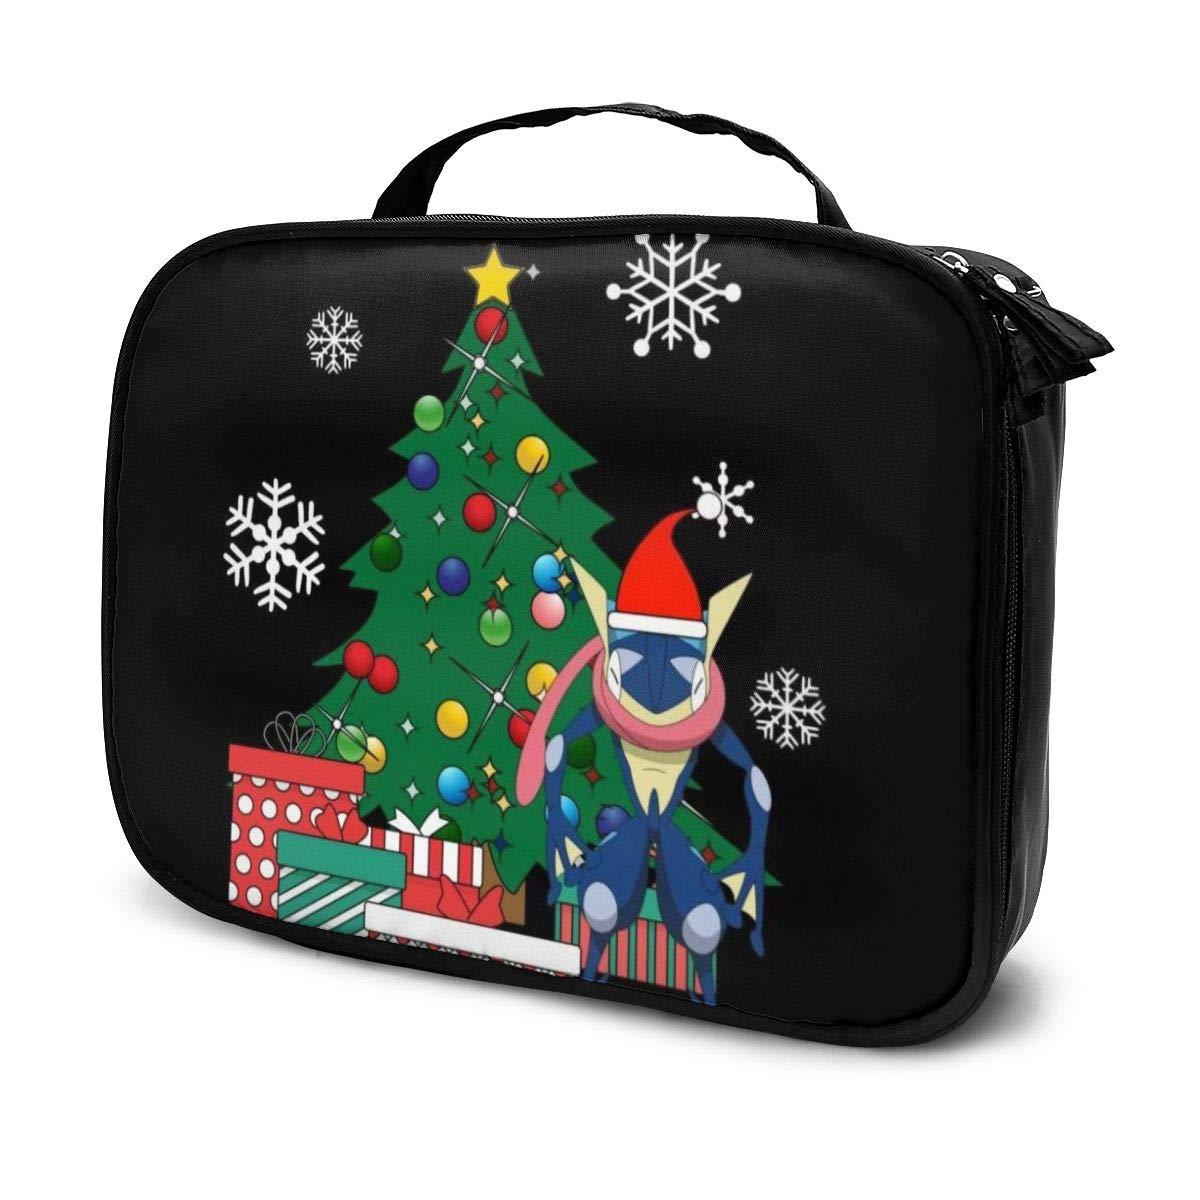 Makeup Bag Cosmetic Pouch Greninja Monster Of The Pocket Around The Christmas Tree Multi-Functional Bag Travel Kit